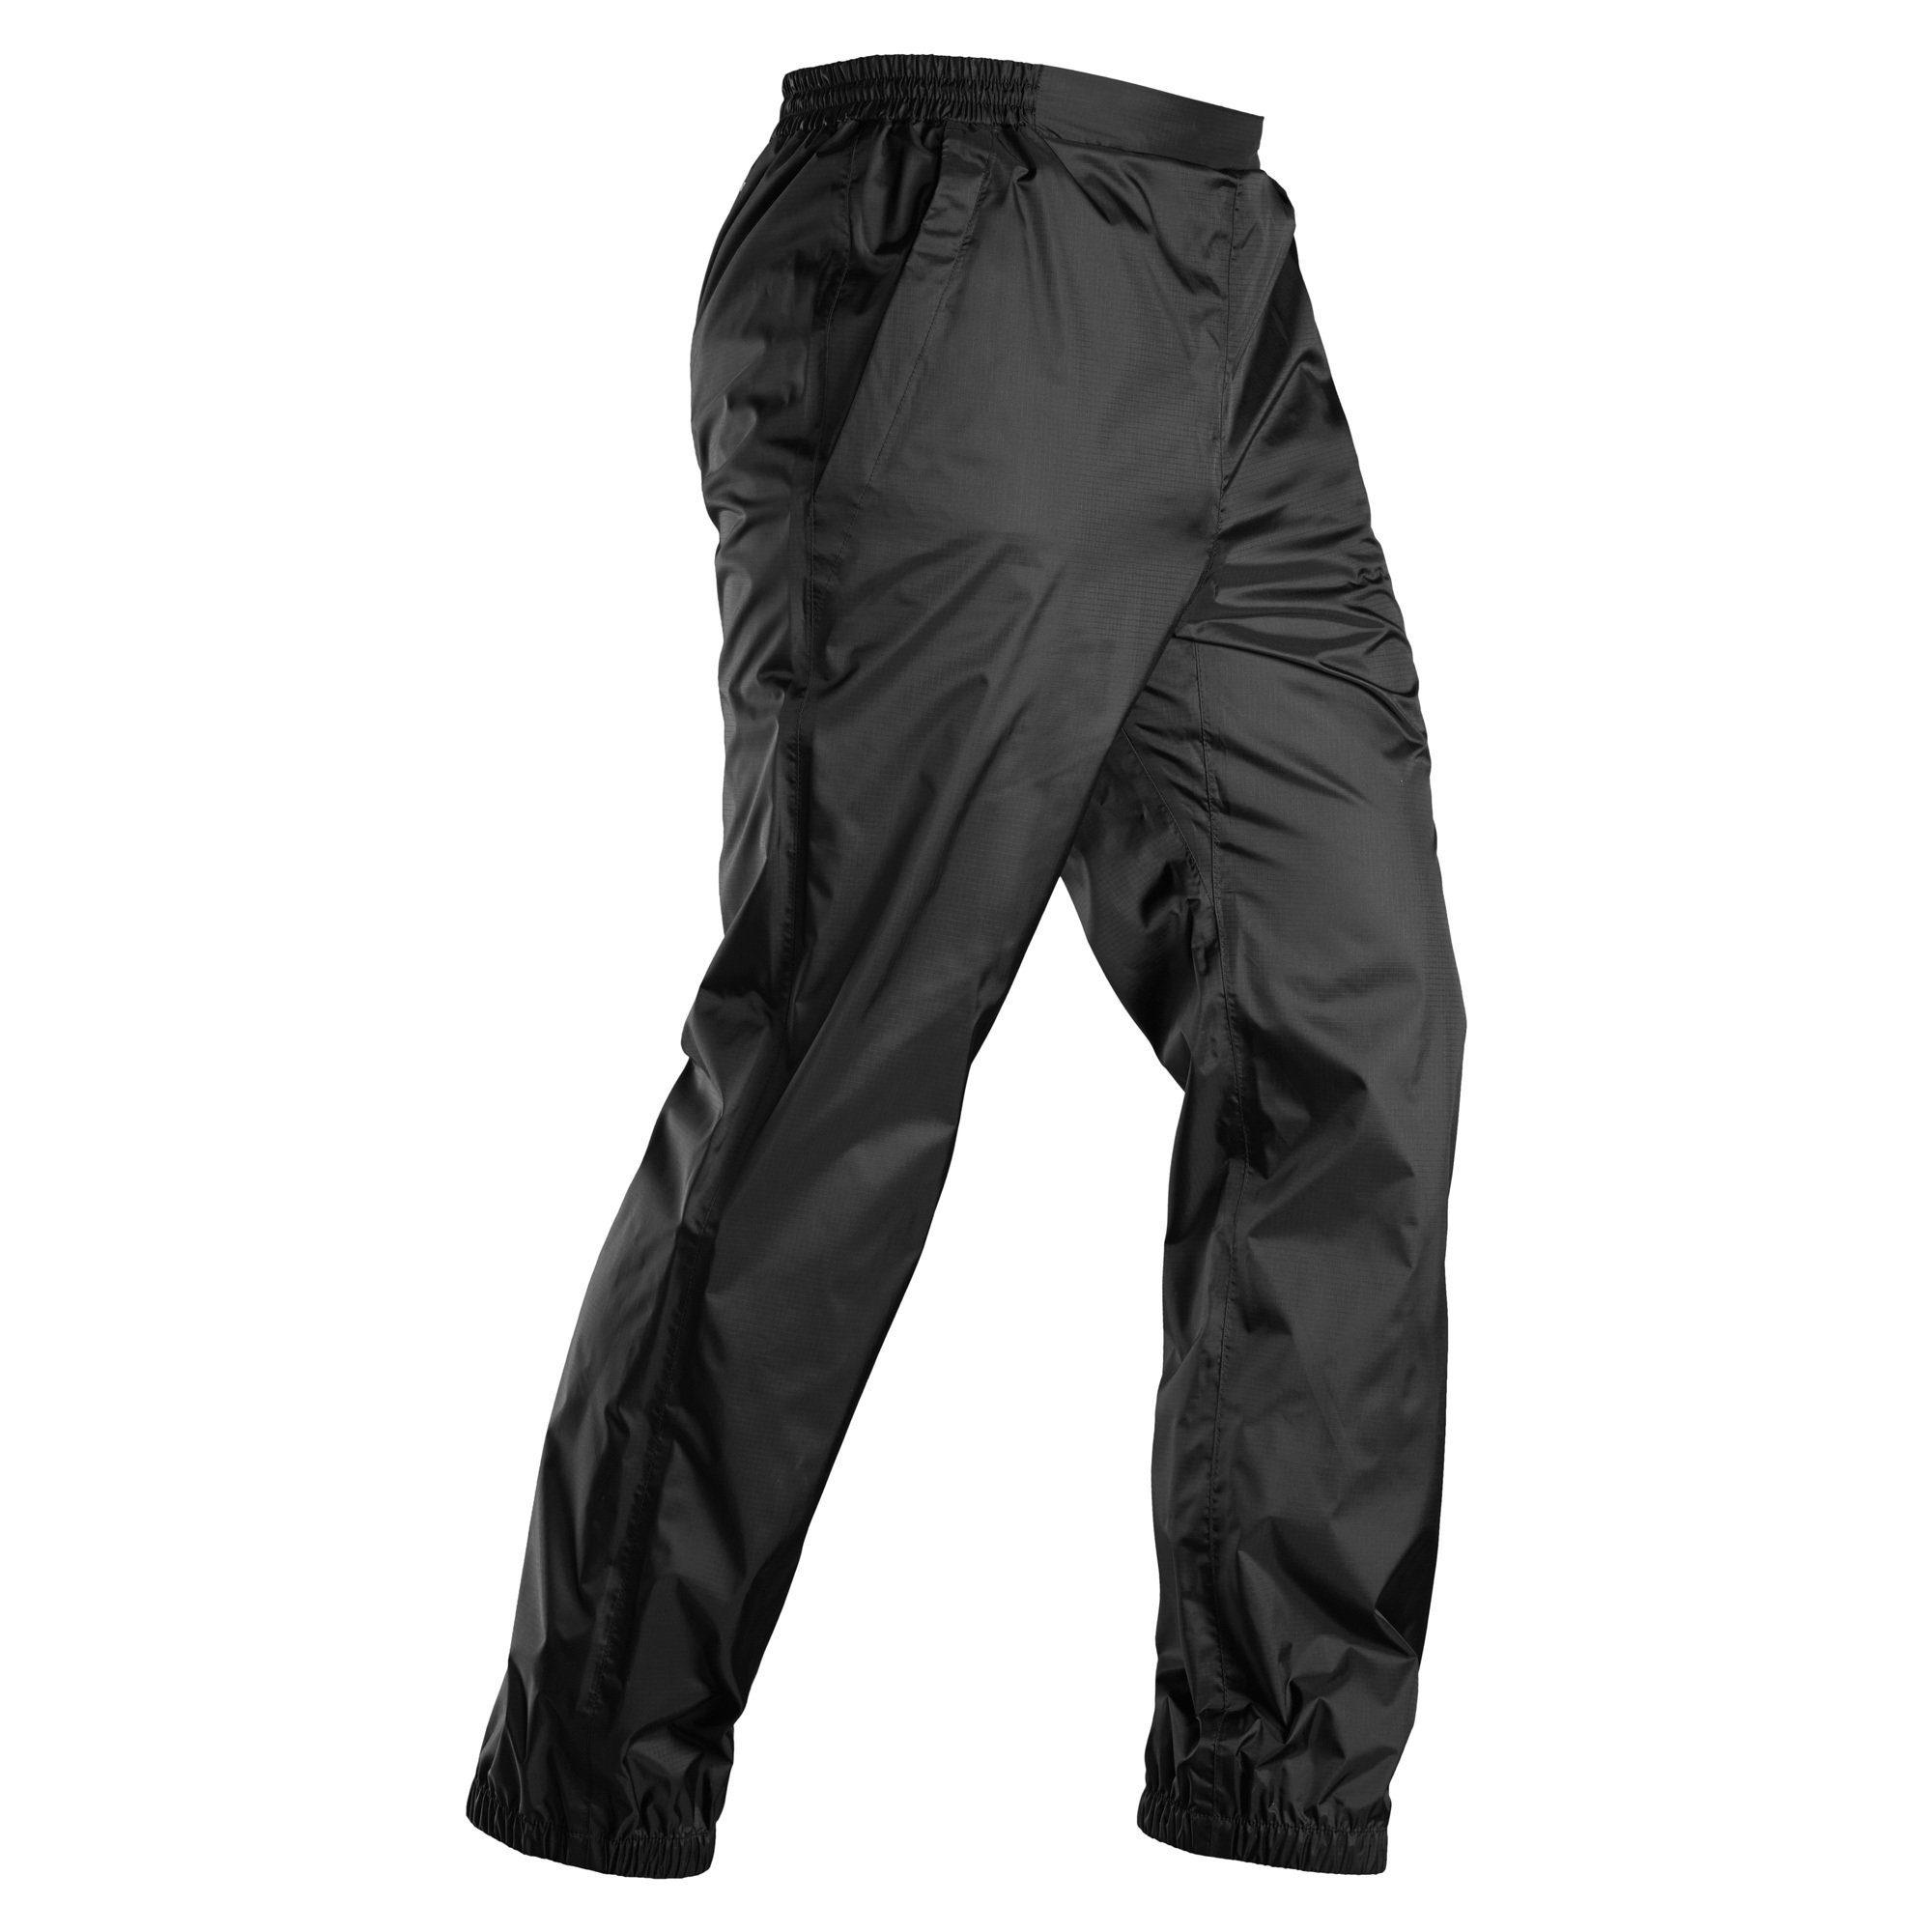 Kathmandu Regenhose Pocket-it v3 | Sportbekleidung > Sporthosen > Regenhosen | Kathmandu